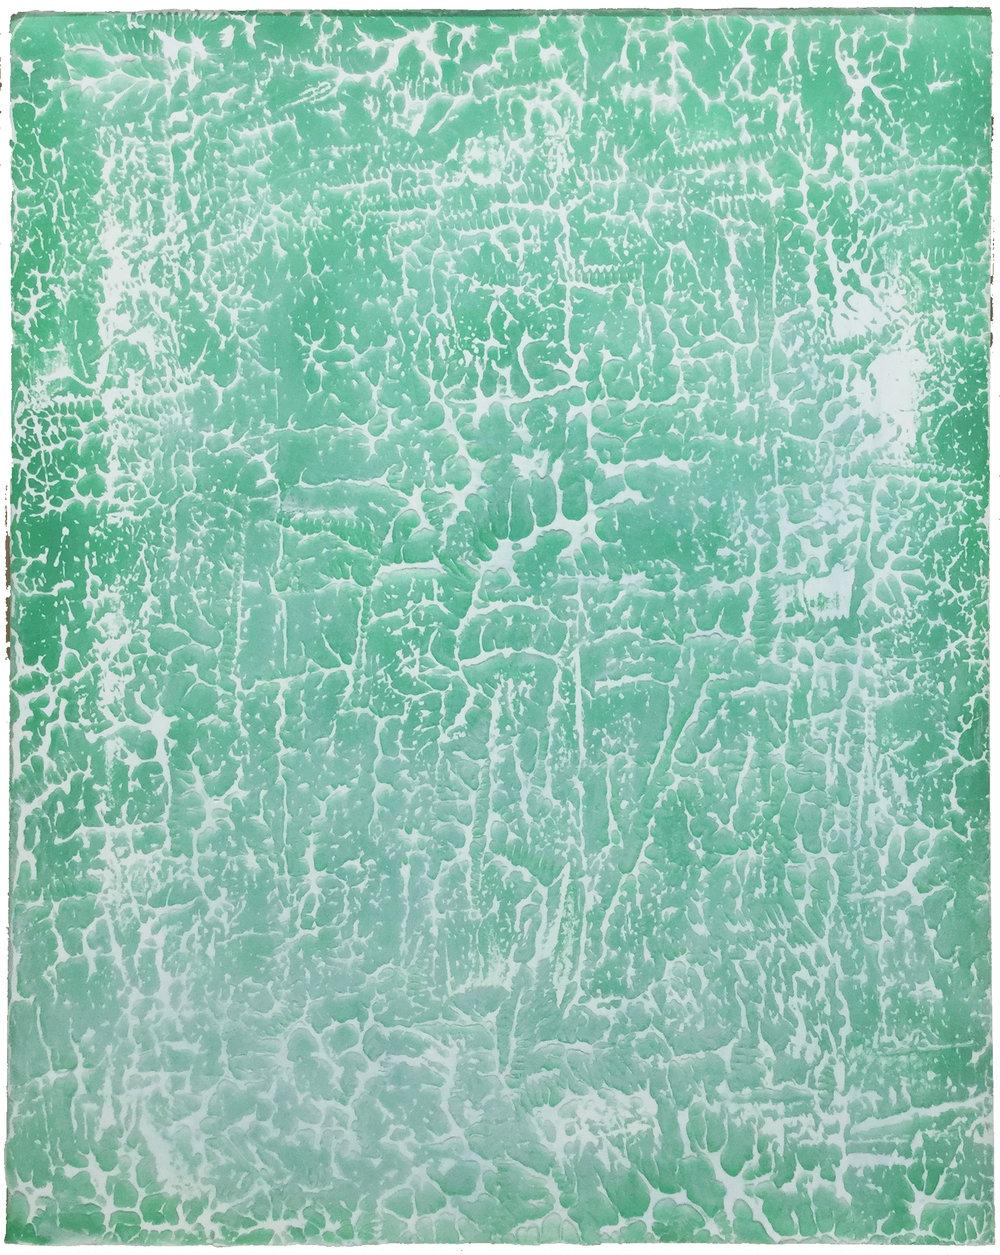 "Ronchamps 03, 2017, plaster, acrylic and spray paint on gypsum, 30 X 24"" (76 X 61 cm)"